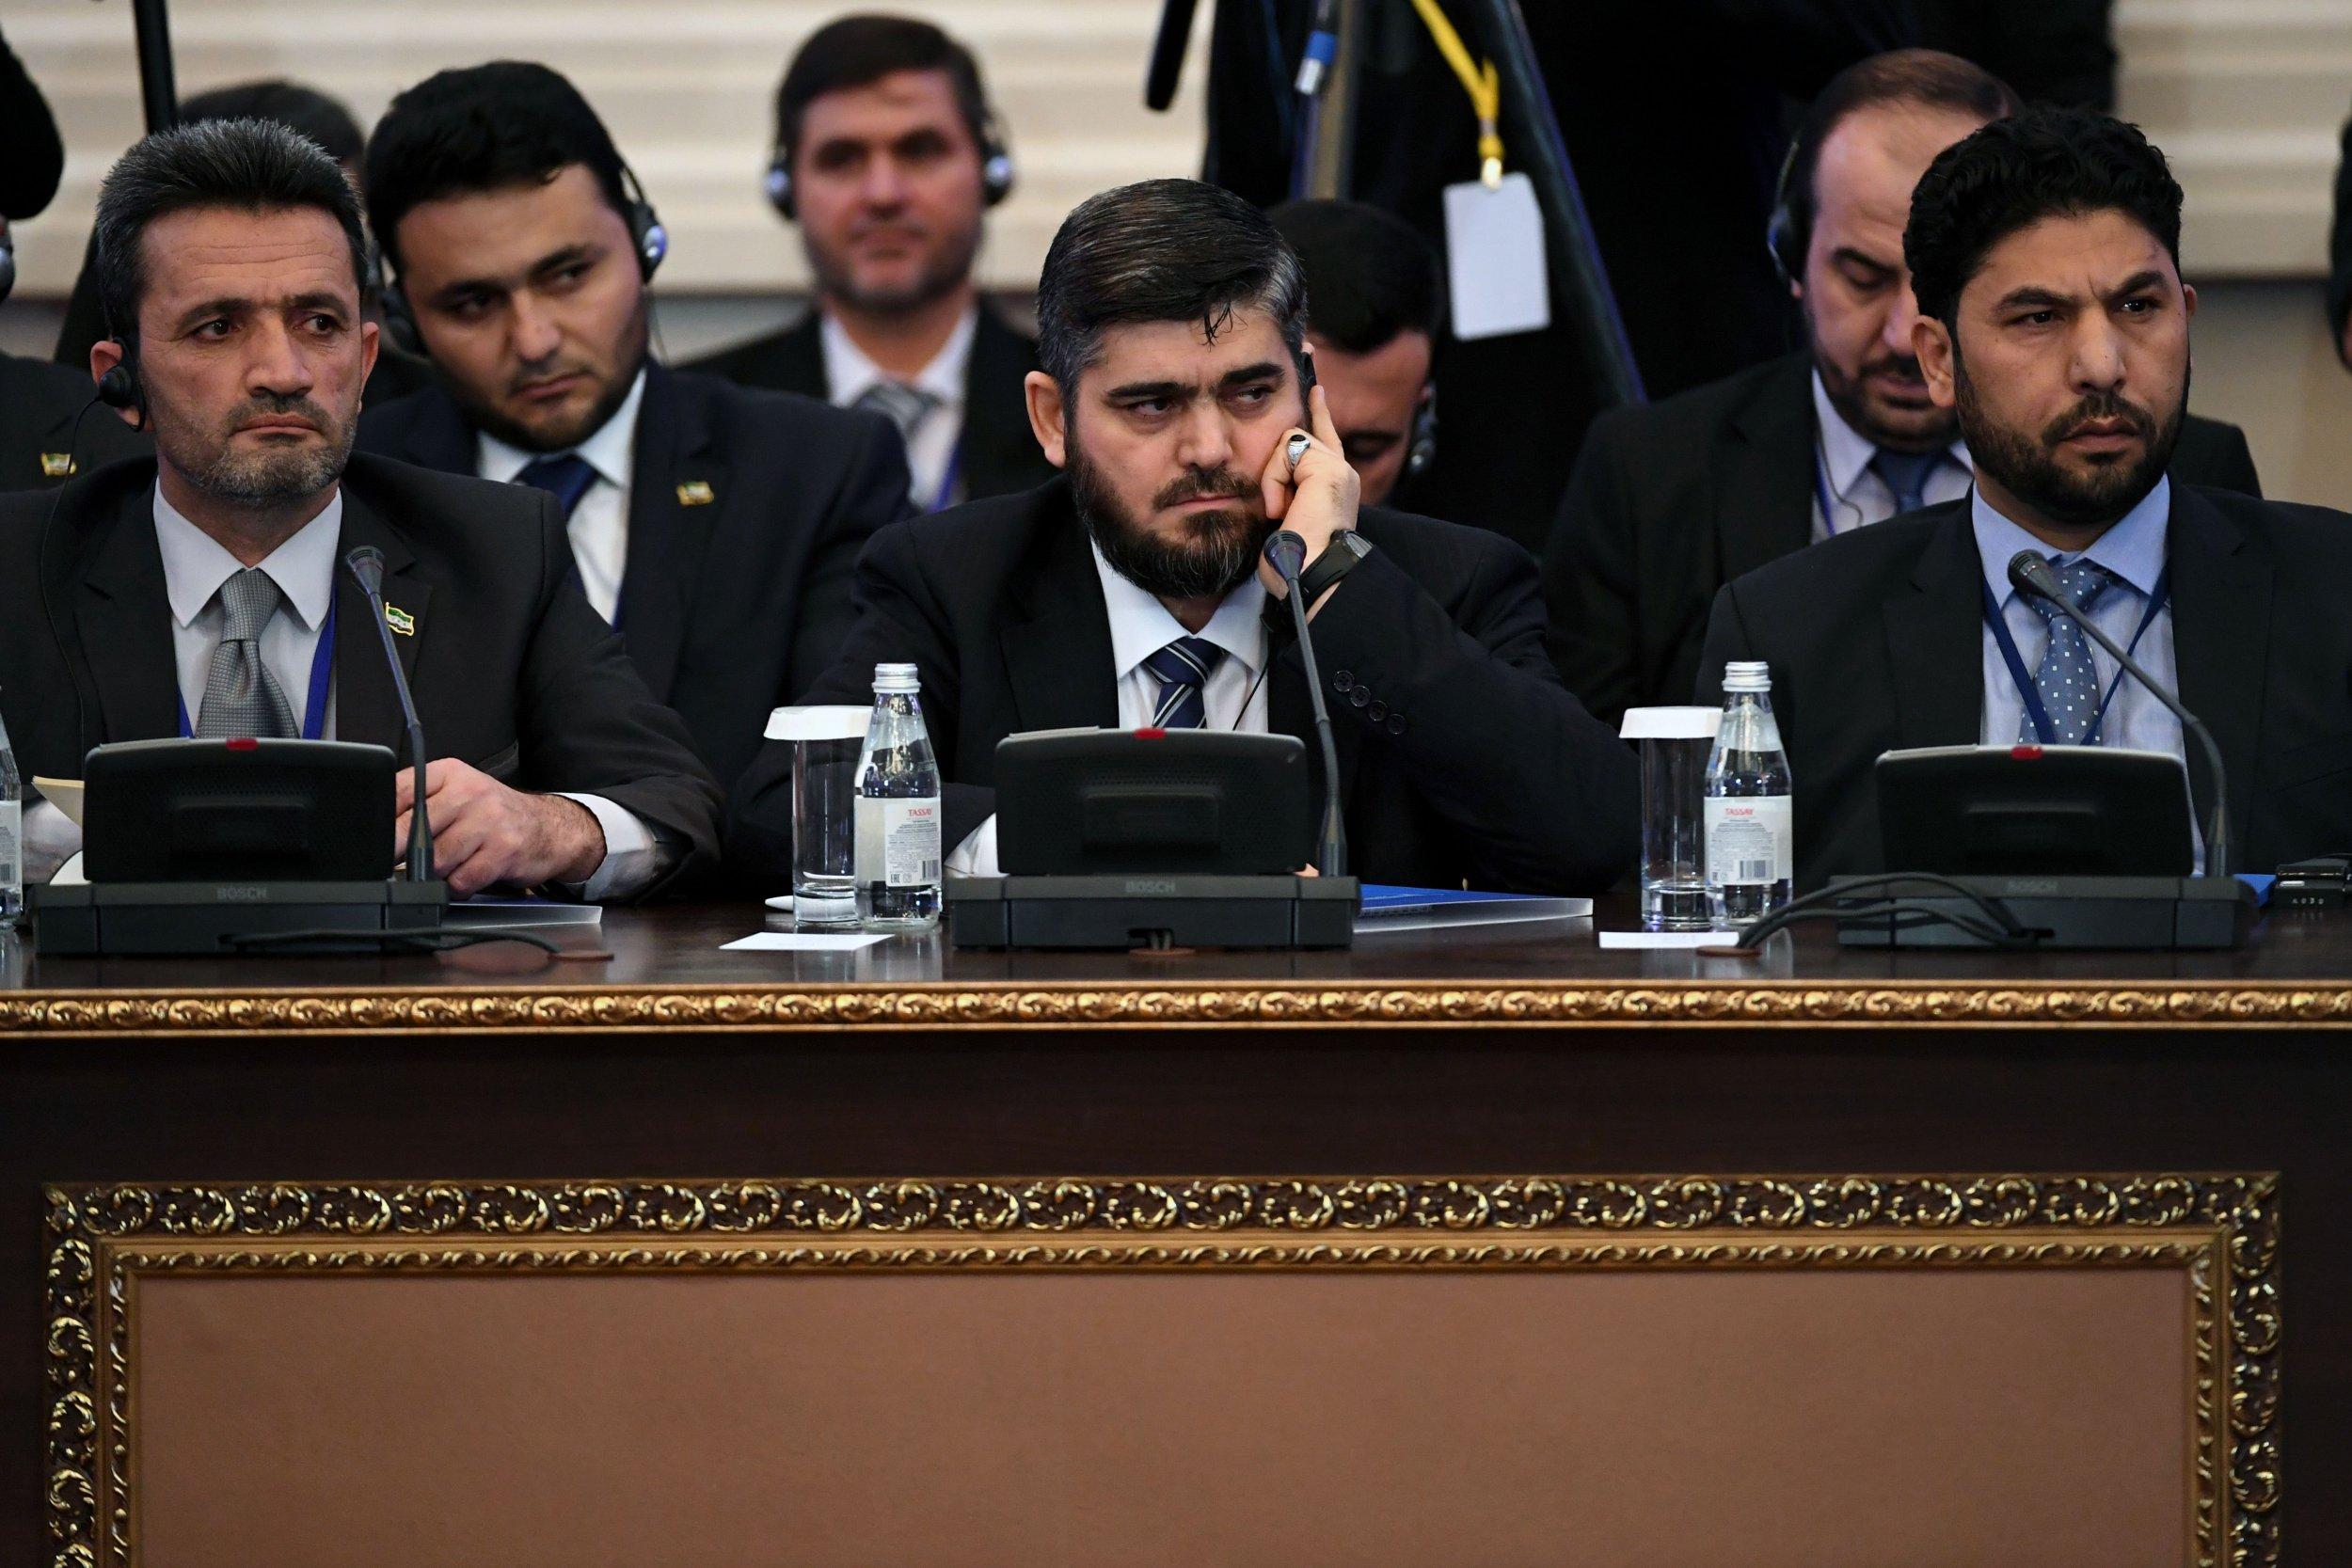 Chief Syrian opposition negotiator